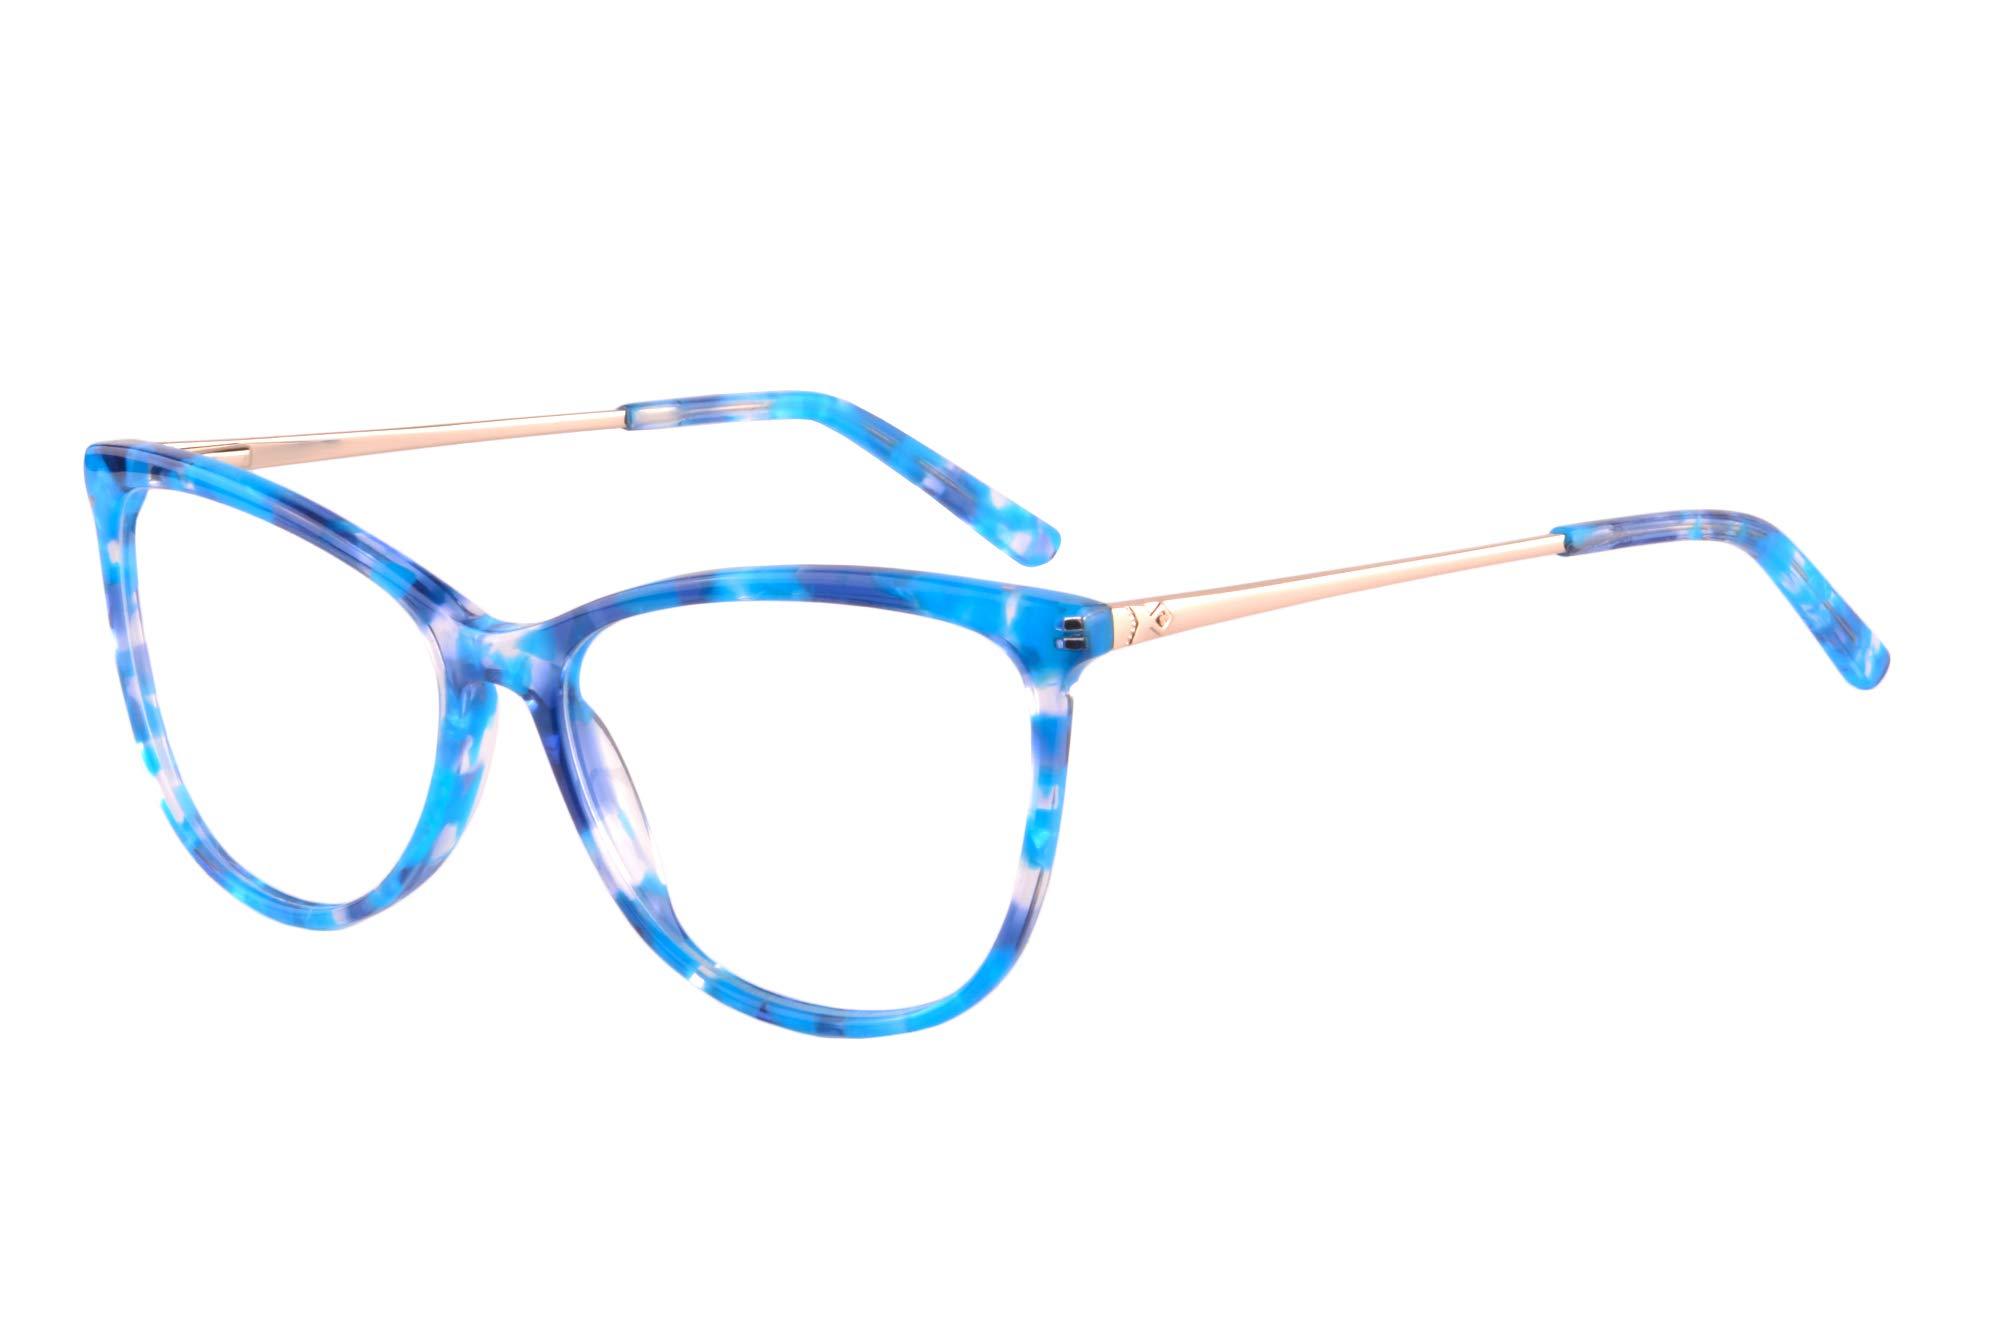 UOOUOO Womens/Mens Acetate Cateye Computer Gaming Glasses, Anti-blue Light, Filter Harmful Rays-RD147